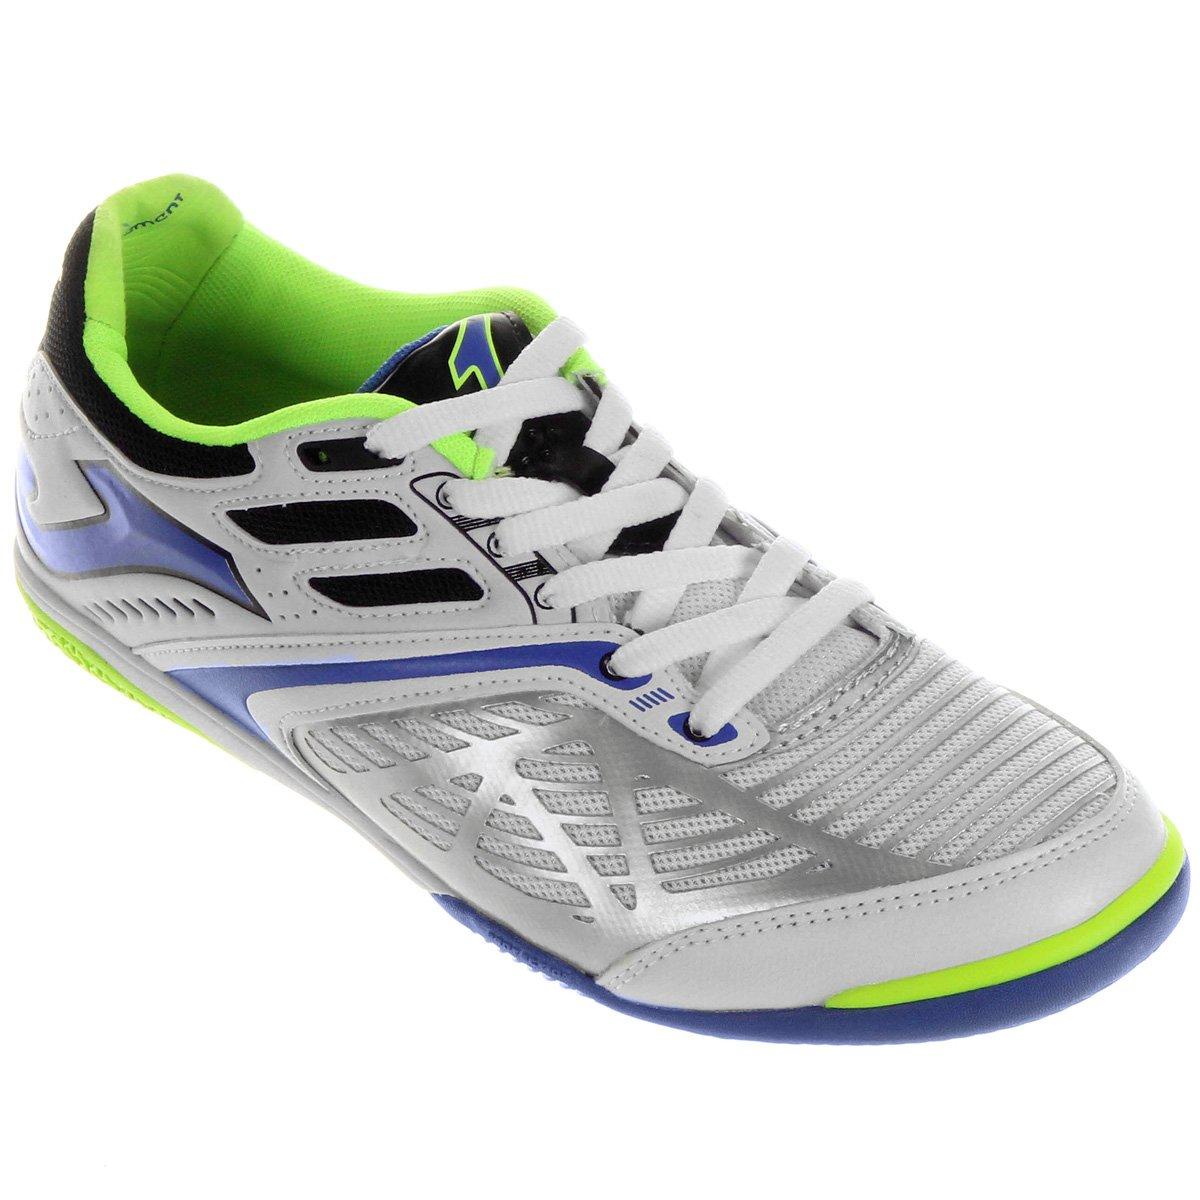 19f73b0c70 Chuteira Joma Lozano Futsal - Compre Agora